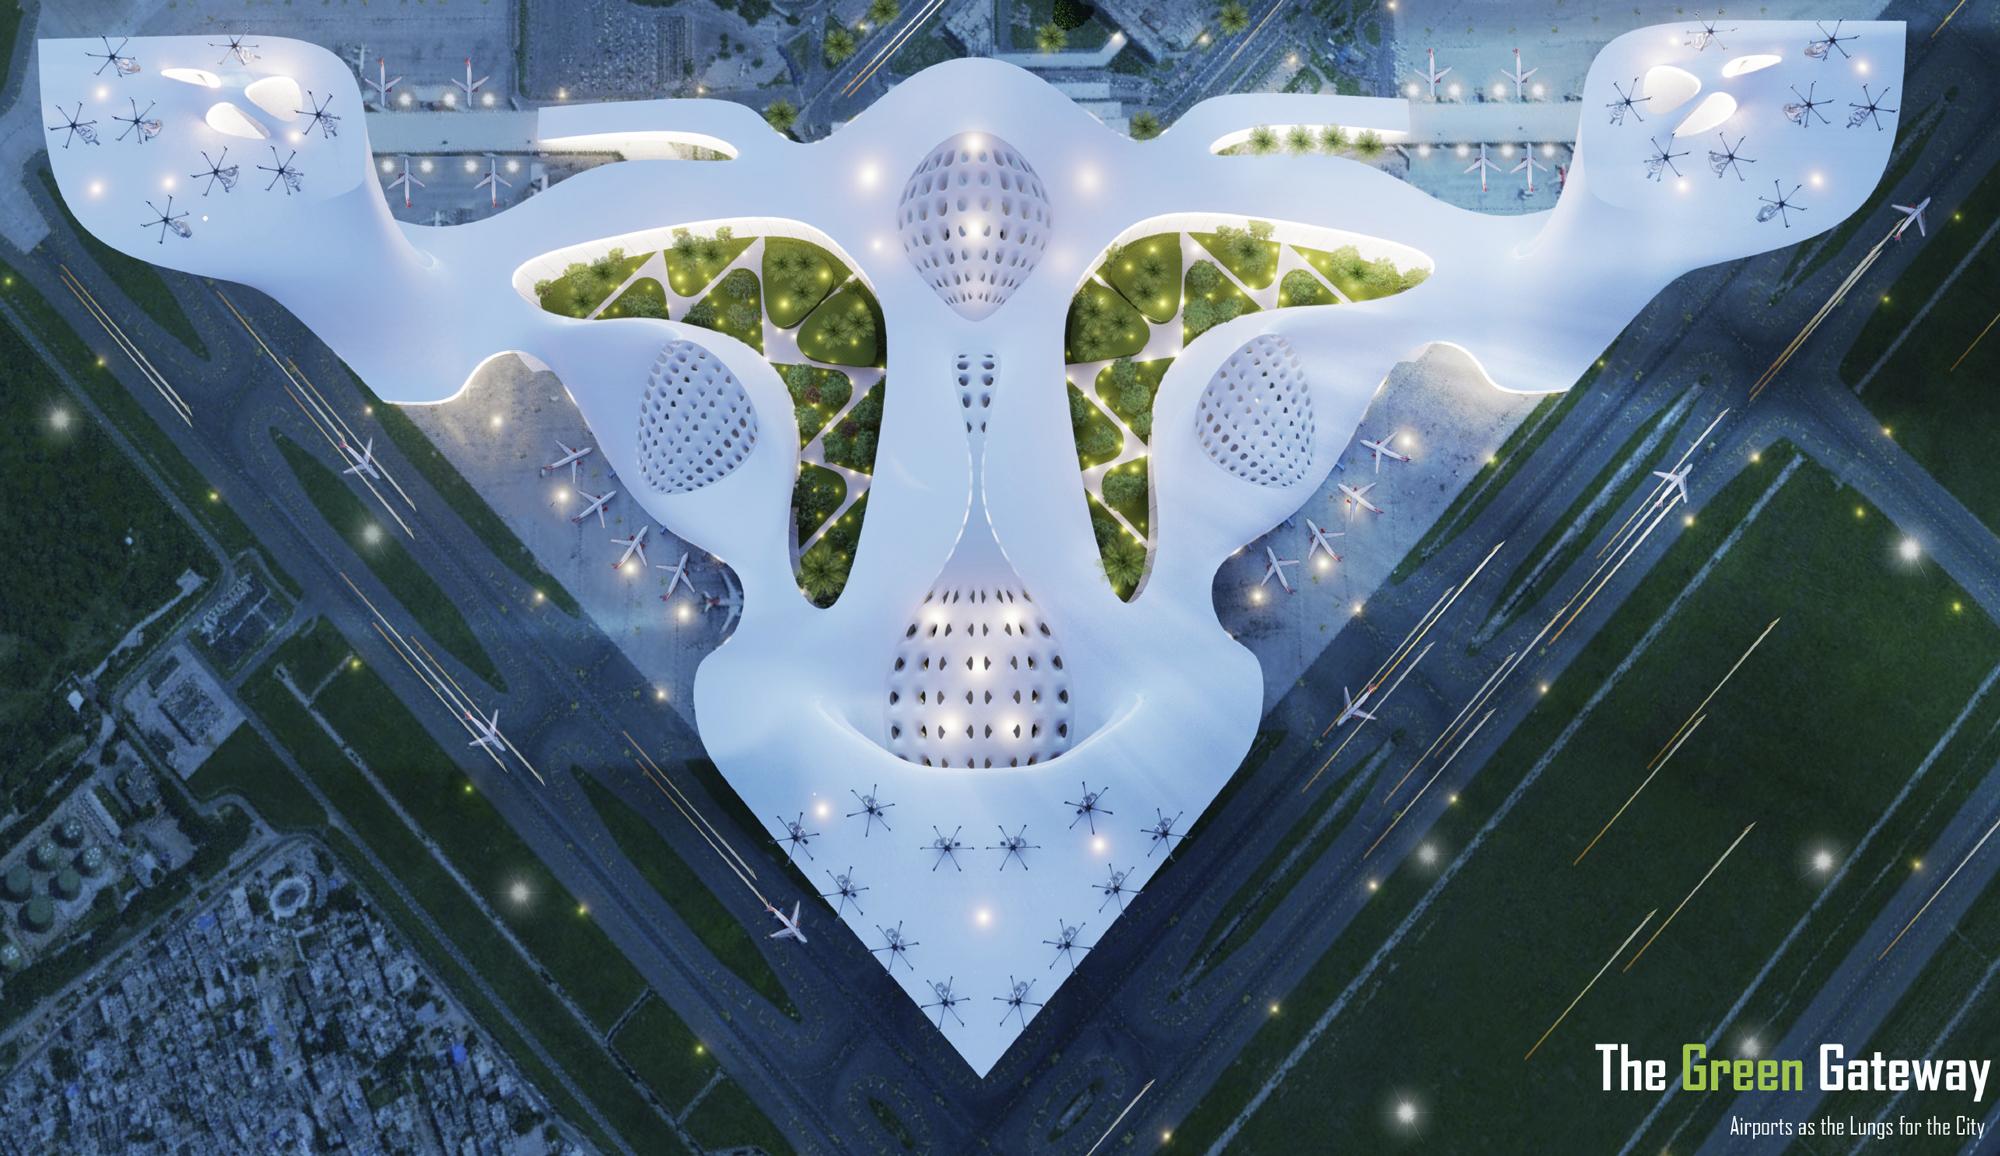 aerial architecture render